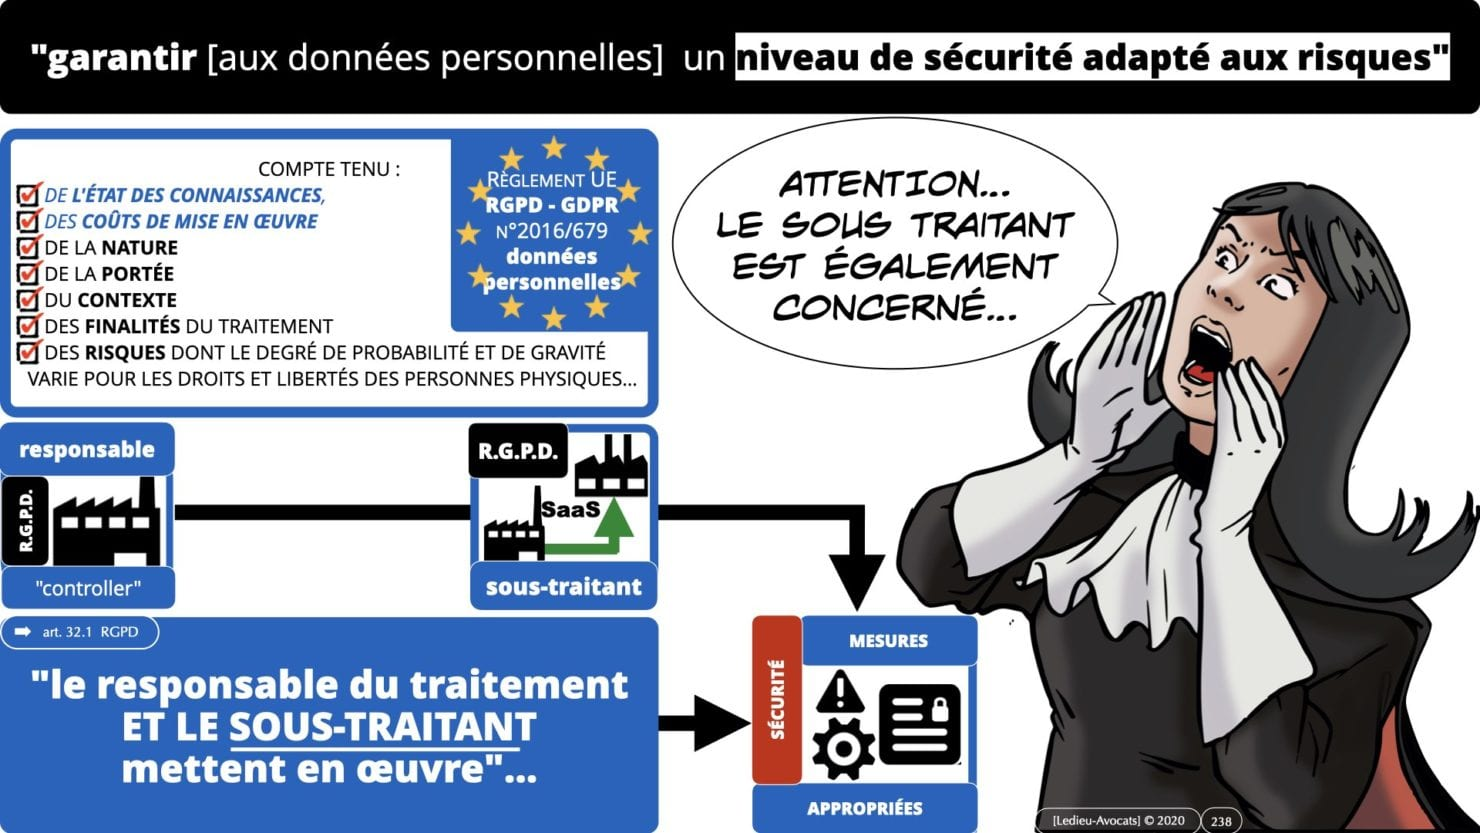 RGPD e-Privacy principes actualité jurisprudence ©Ledieu-Avocats 25-06-2021.238